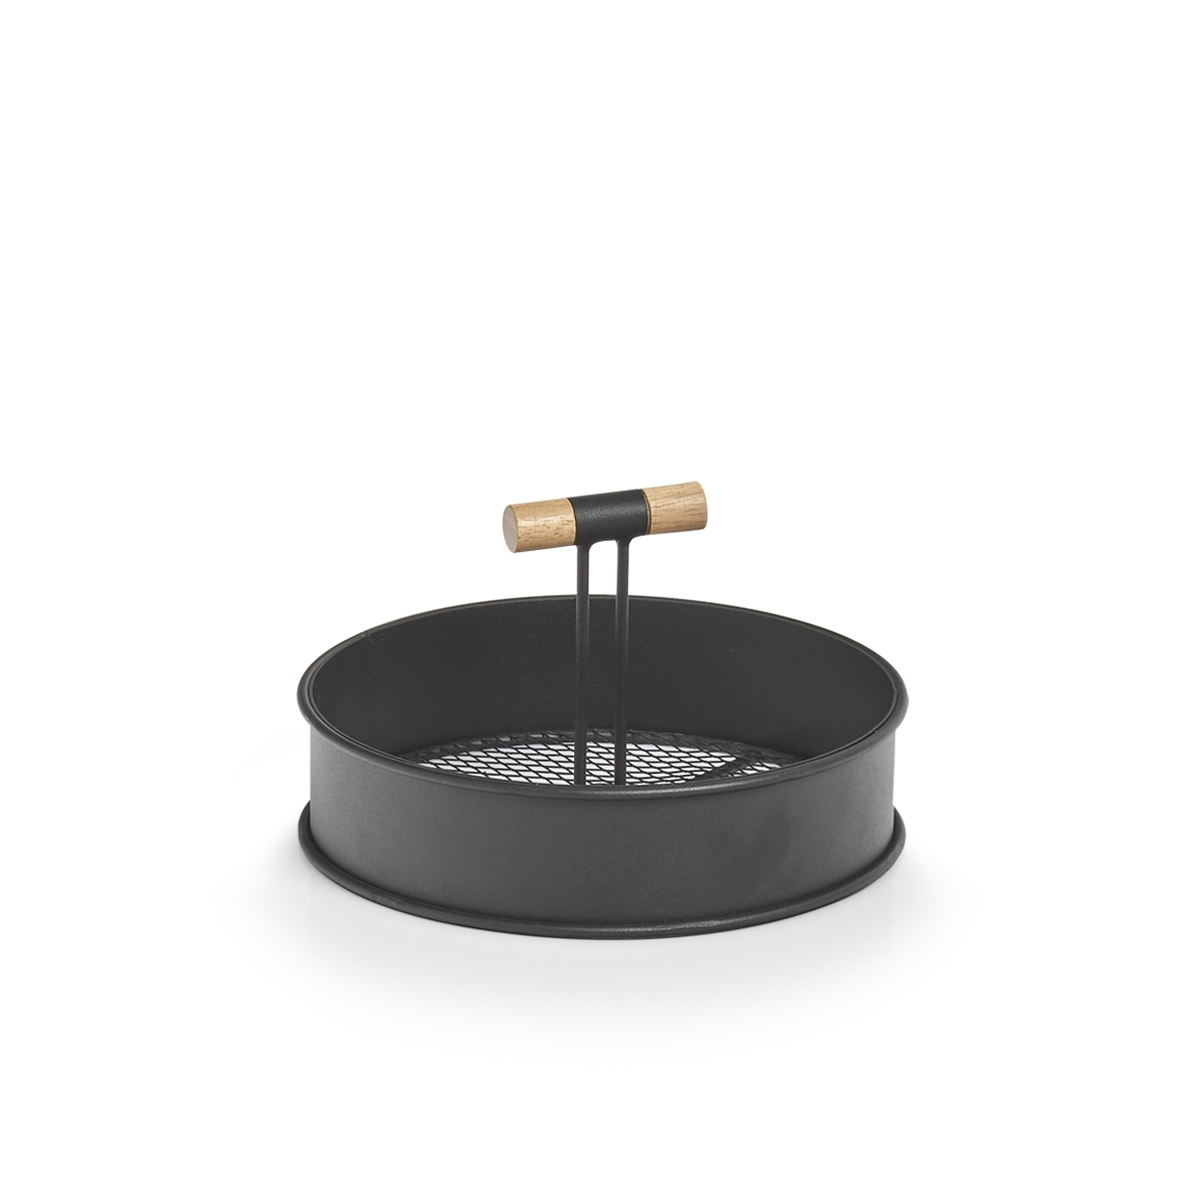 Tava pentru servire din metal, Wood Small Negru, Ø20xH11,6 cm poza